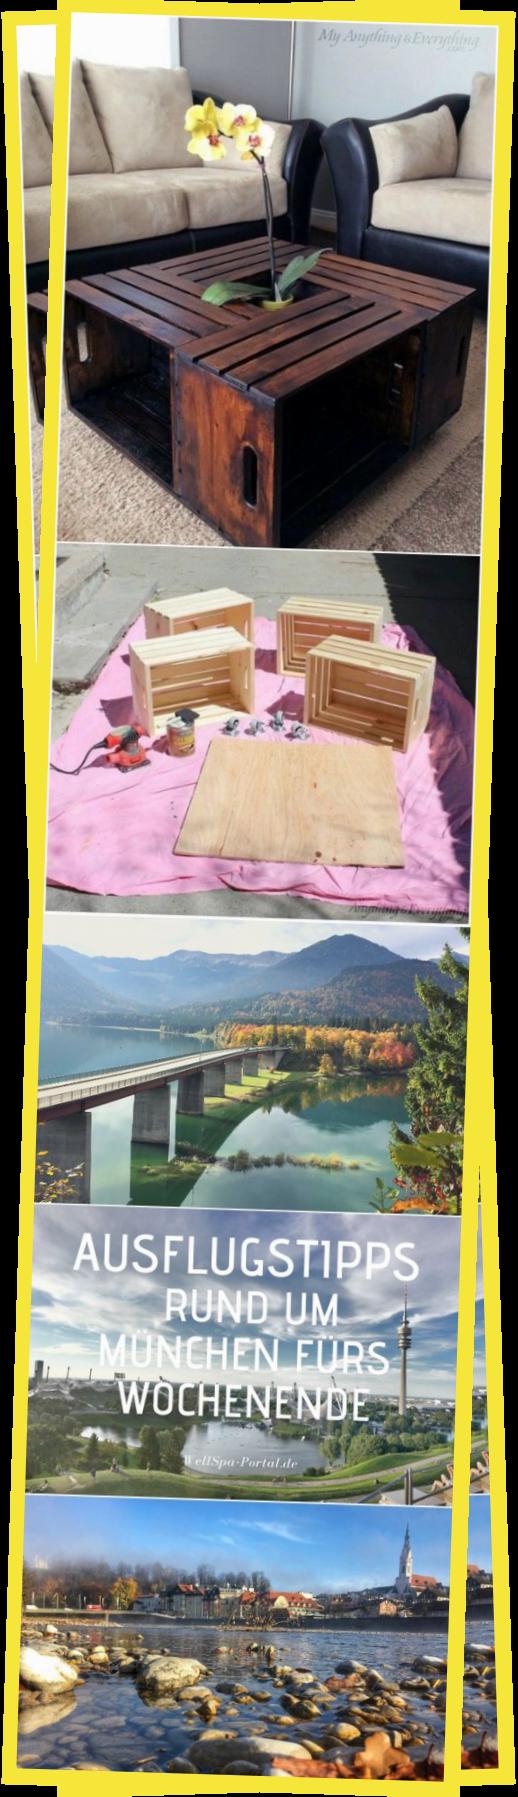 25 Holzkiste Upcycling-Projekte für fabelhafte Wohnkultur #decor #fabelhafte - Amalda Fleur - #Amalda #Decor #fabelhafte #Fleur #für #Holzkiste #UpcyclingProjekte #Wohnkultur  #Holzkiste #Upcycling-Projekte #Fabelhafte #Wohnkultur #Decor #Fabelhafte #Amalda #Fleur #Pinity #exploringtravel #more #travel #familytraveldestinations #touristquote #travelideas #irelandtravelideas #sweedenideas